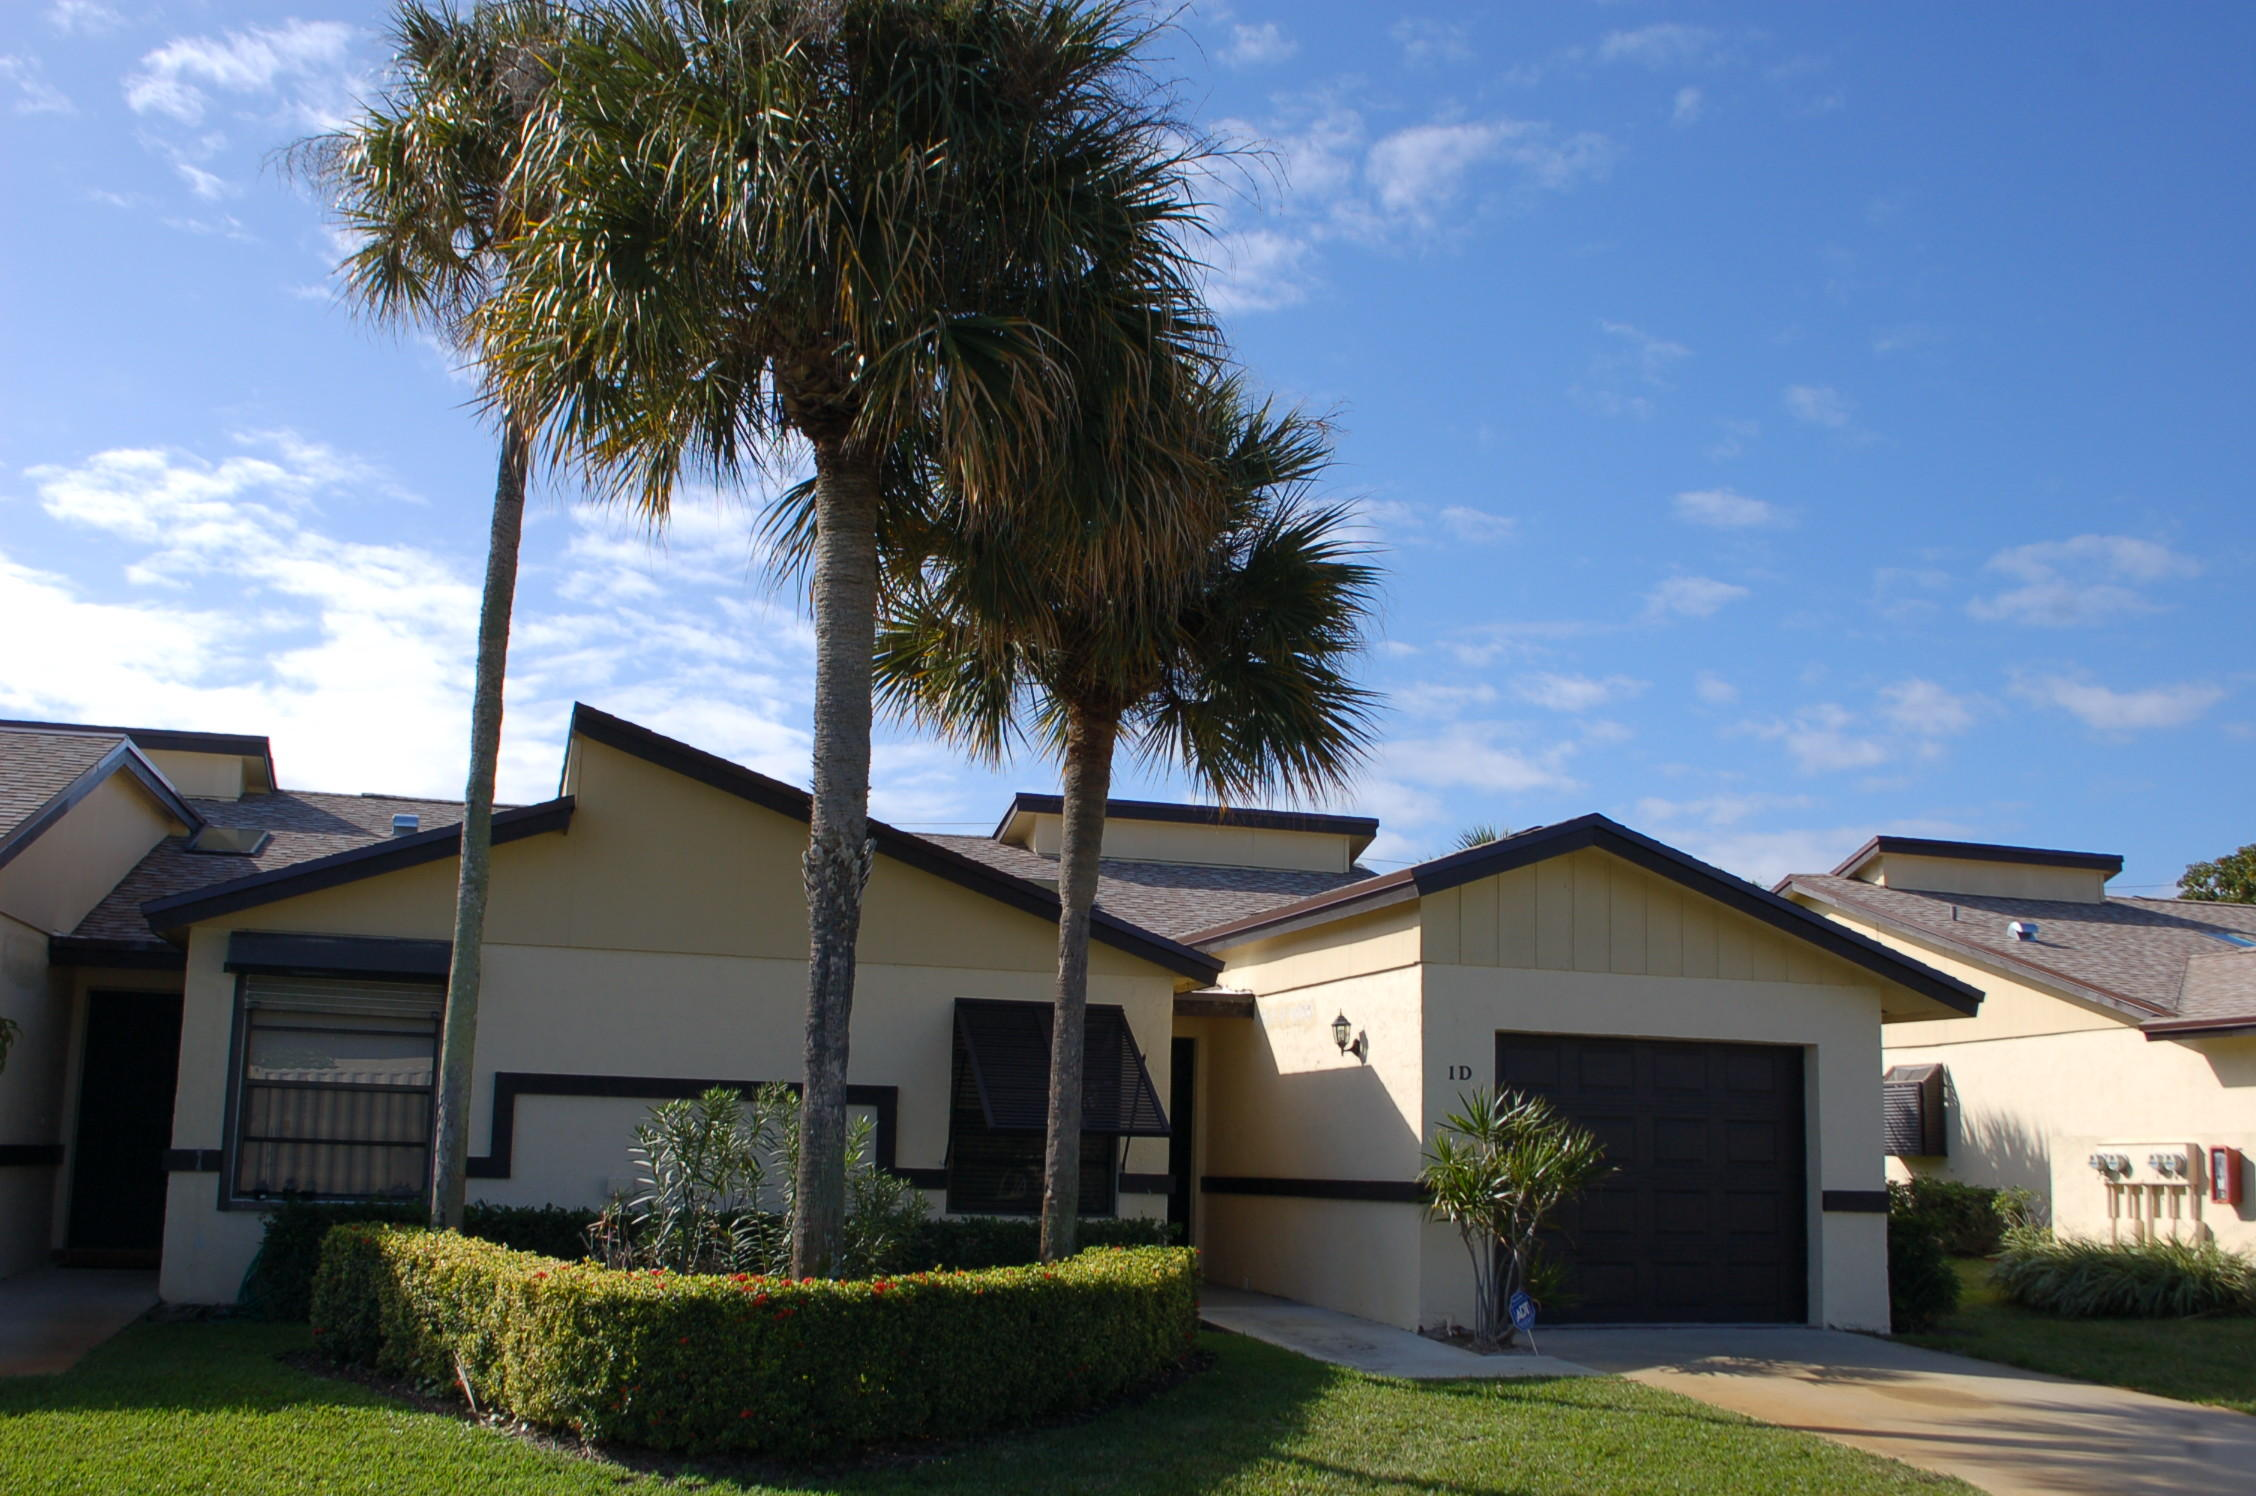 1 Ridgepointe Drive D Boynton Beach, FL 33435